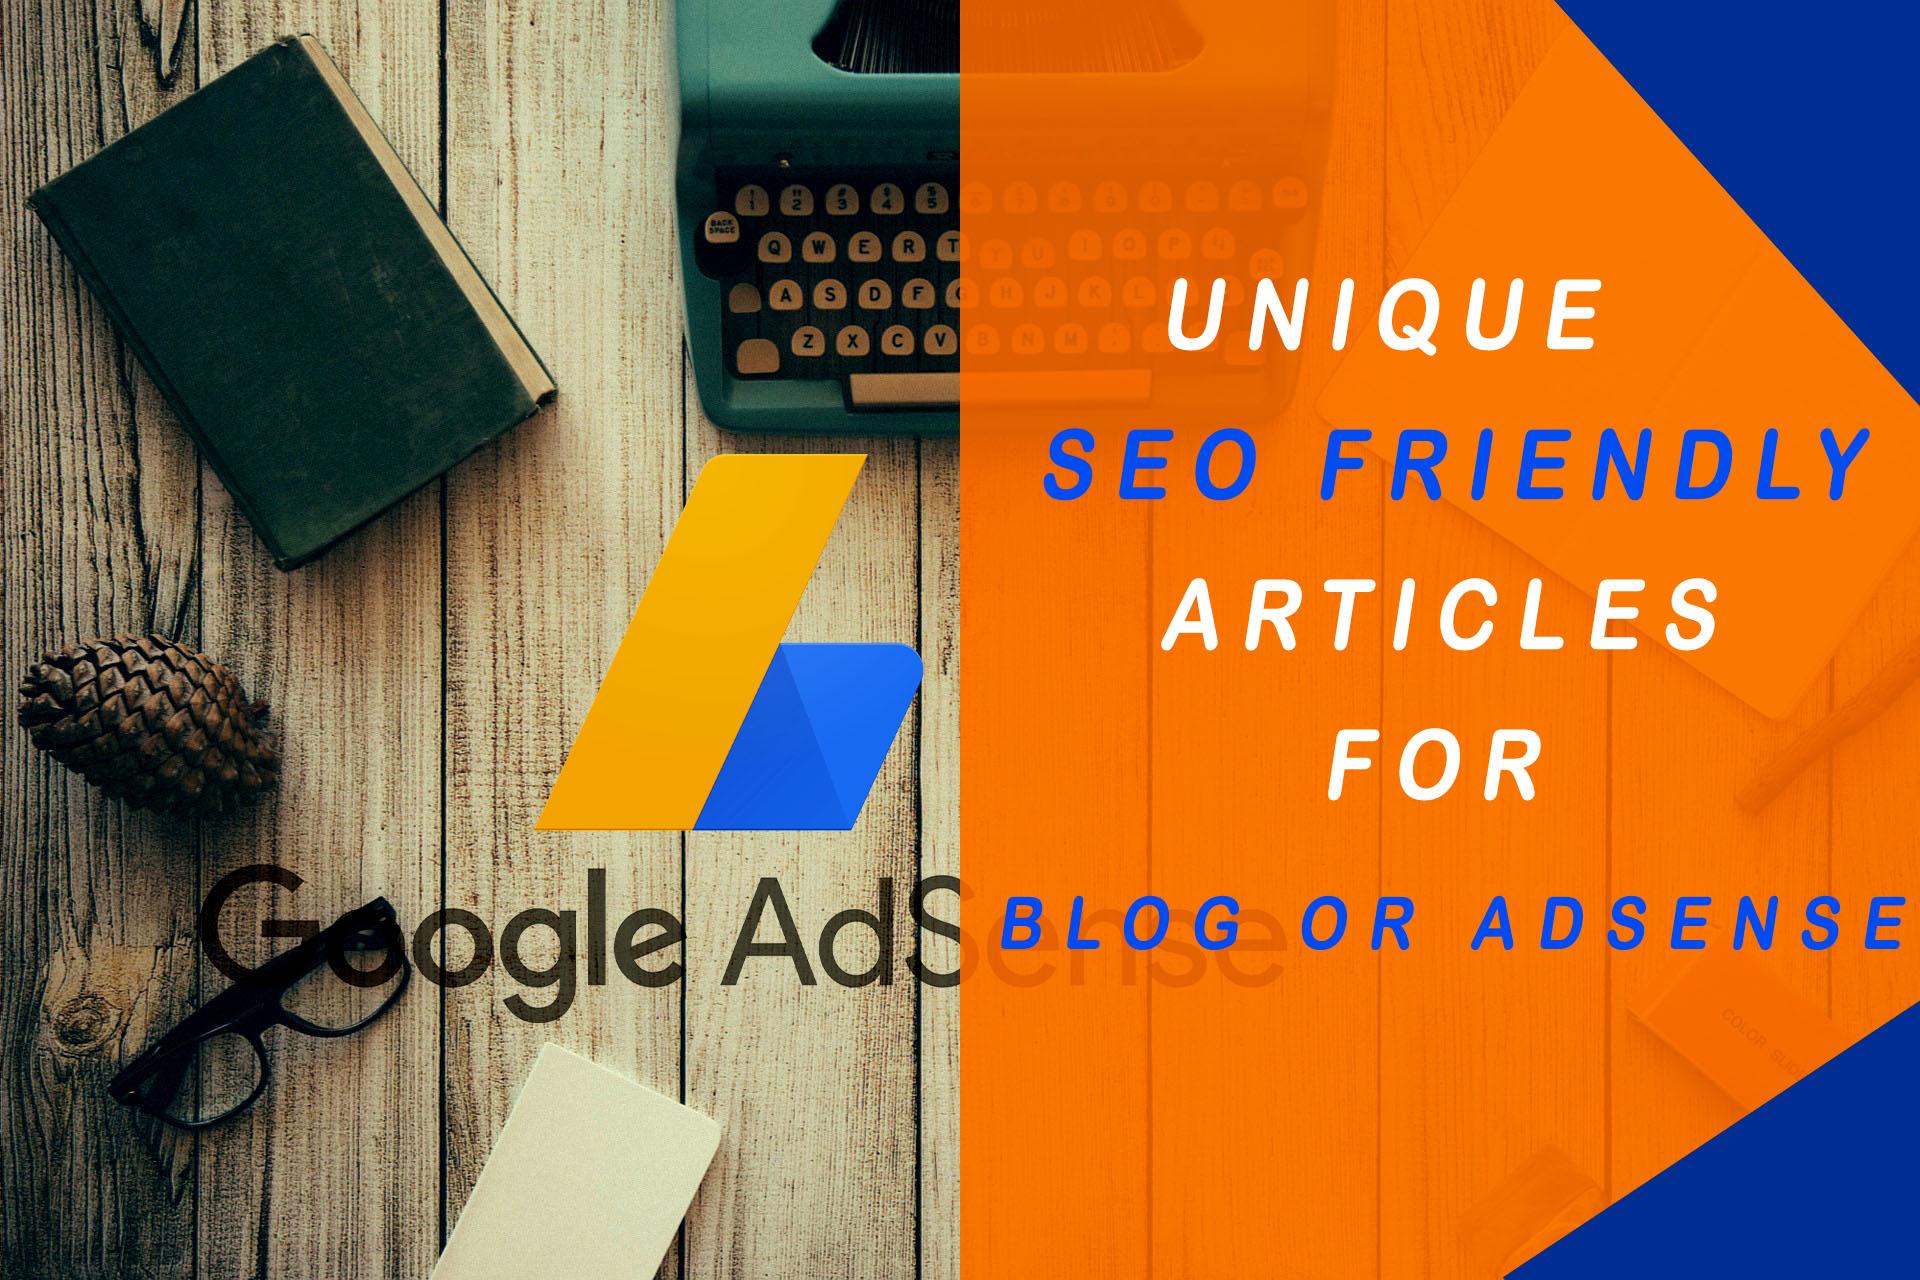 I will write unique seo,  blog or adsense friendly articles